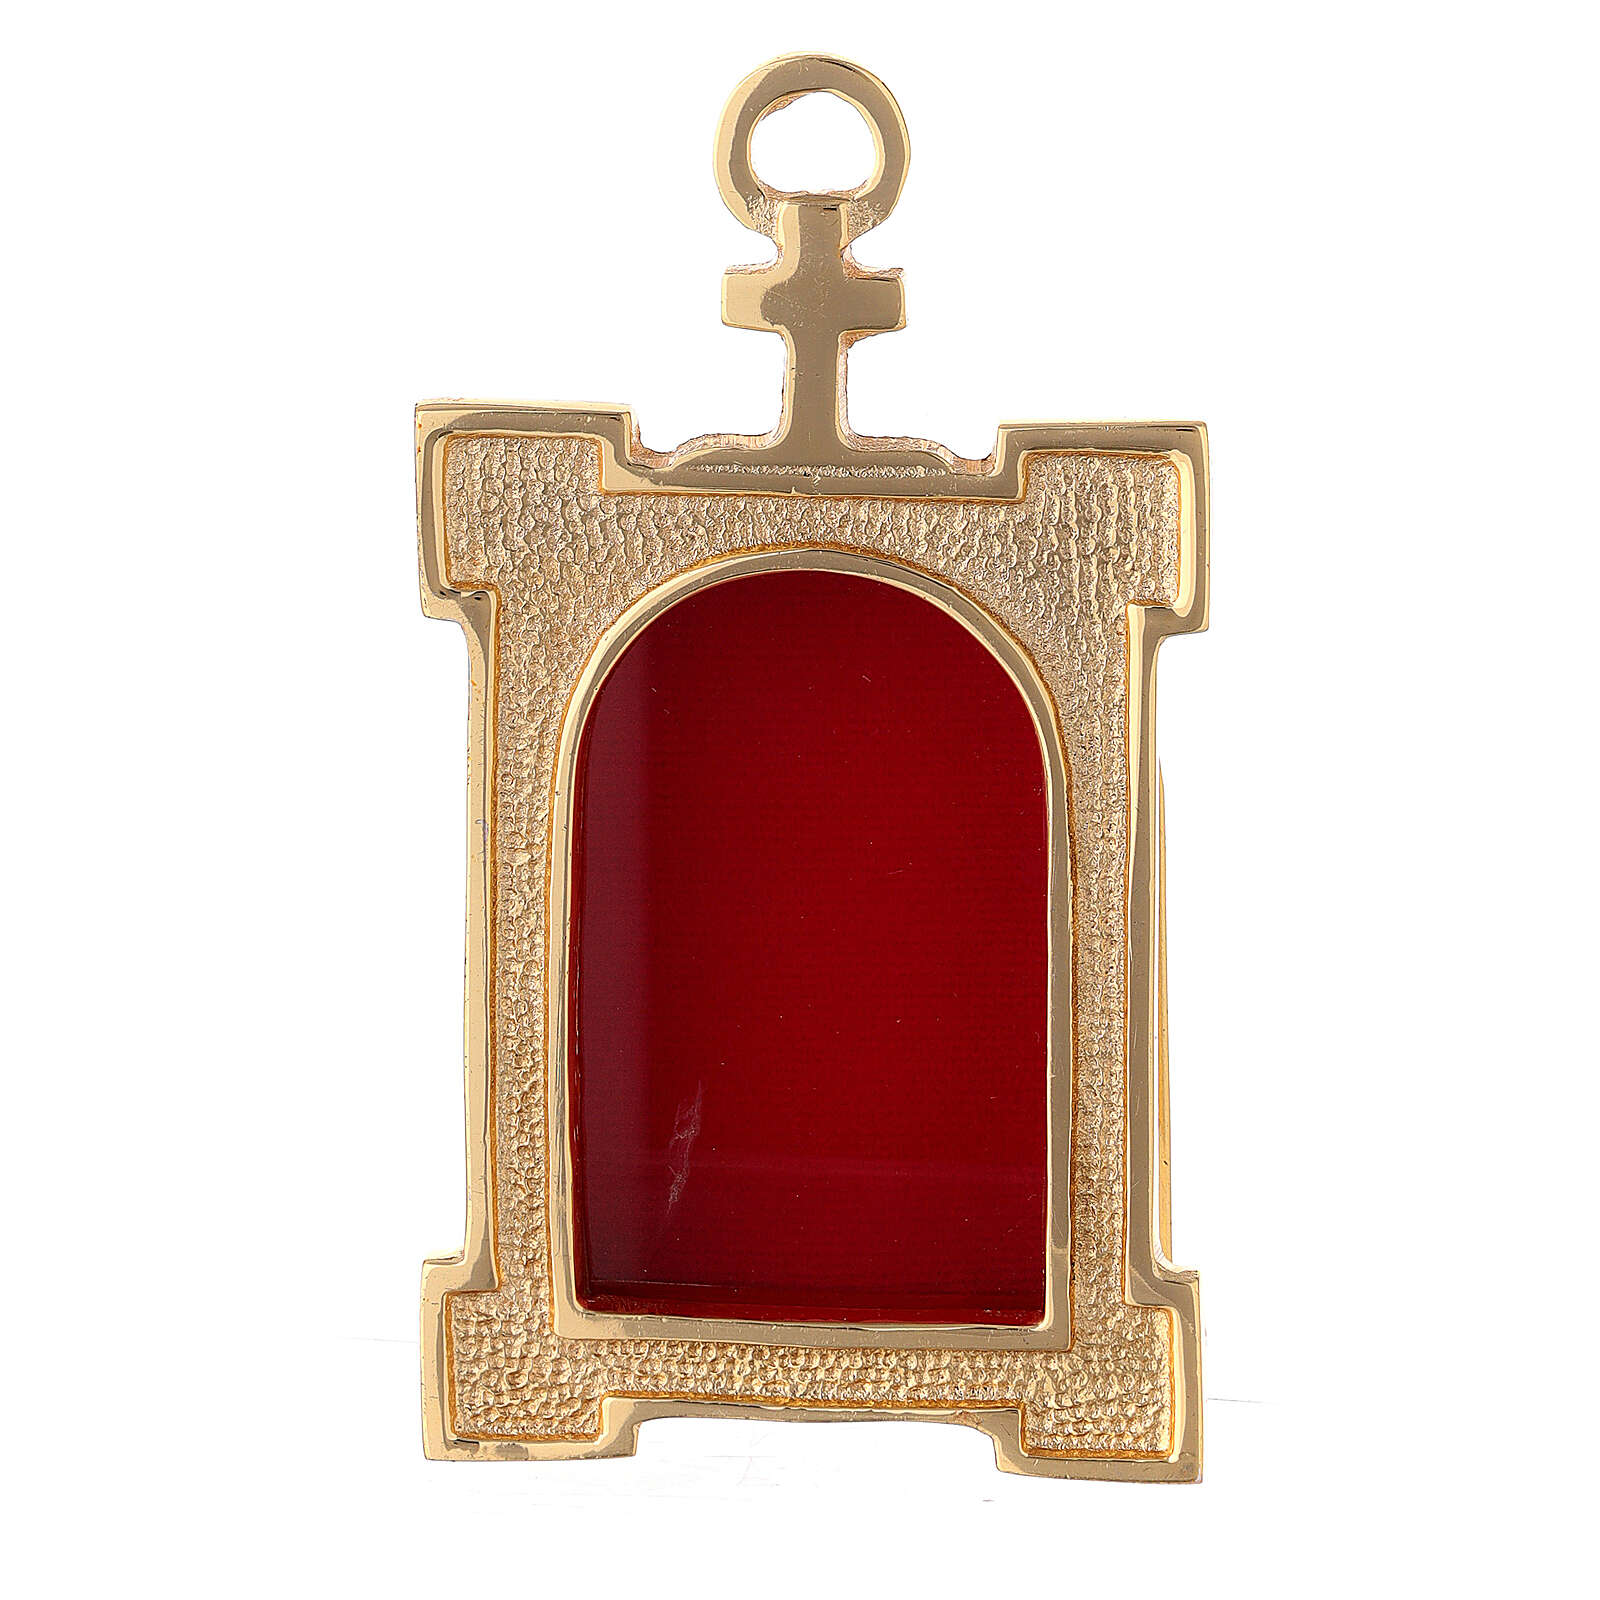 Relicario puerta de pared latón dorado terciopelo rojo 4